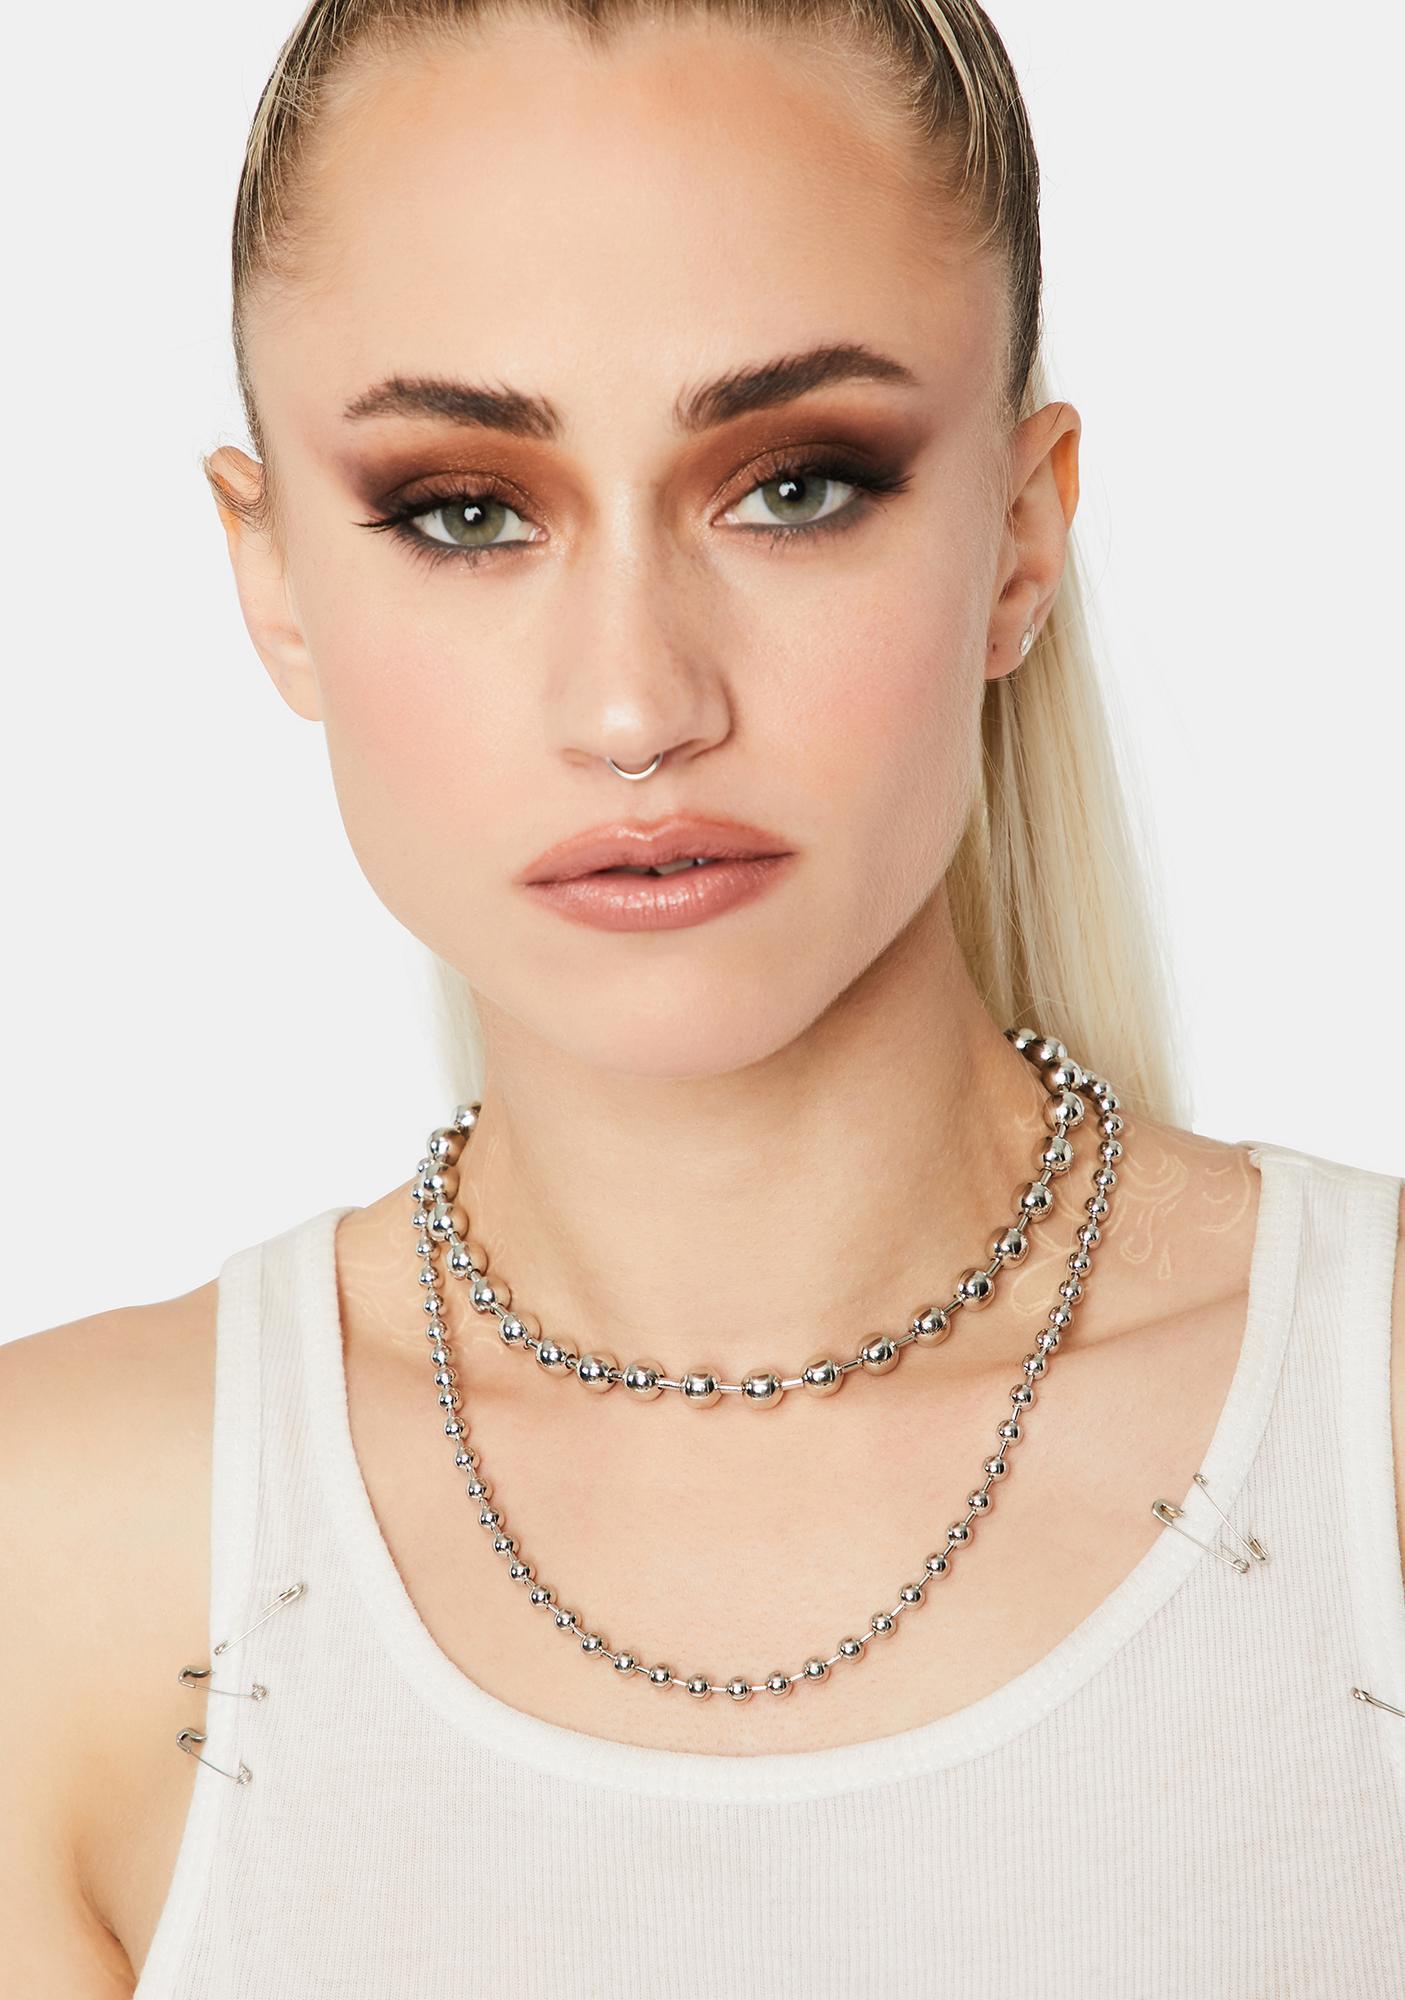 Broken Dreams Ball Chain Necklace